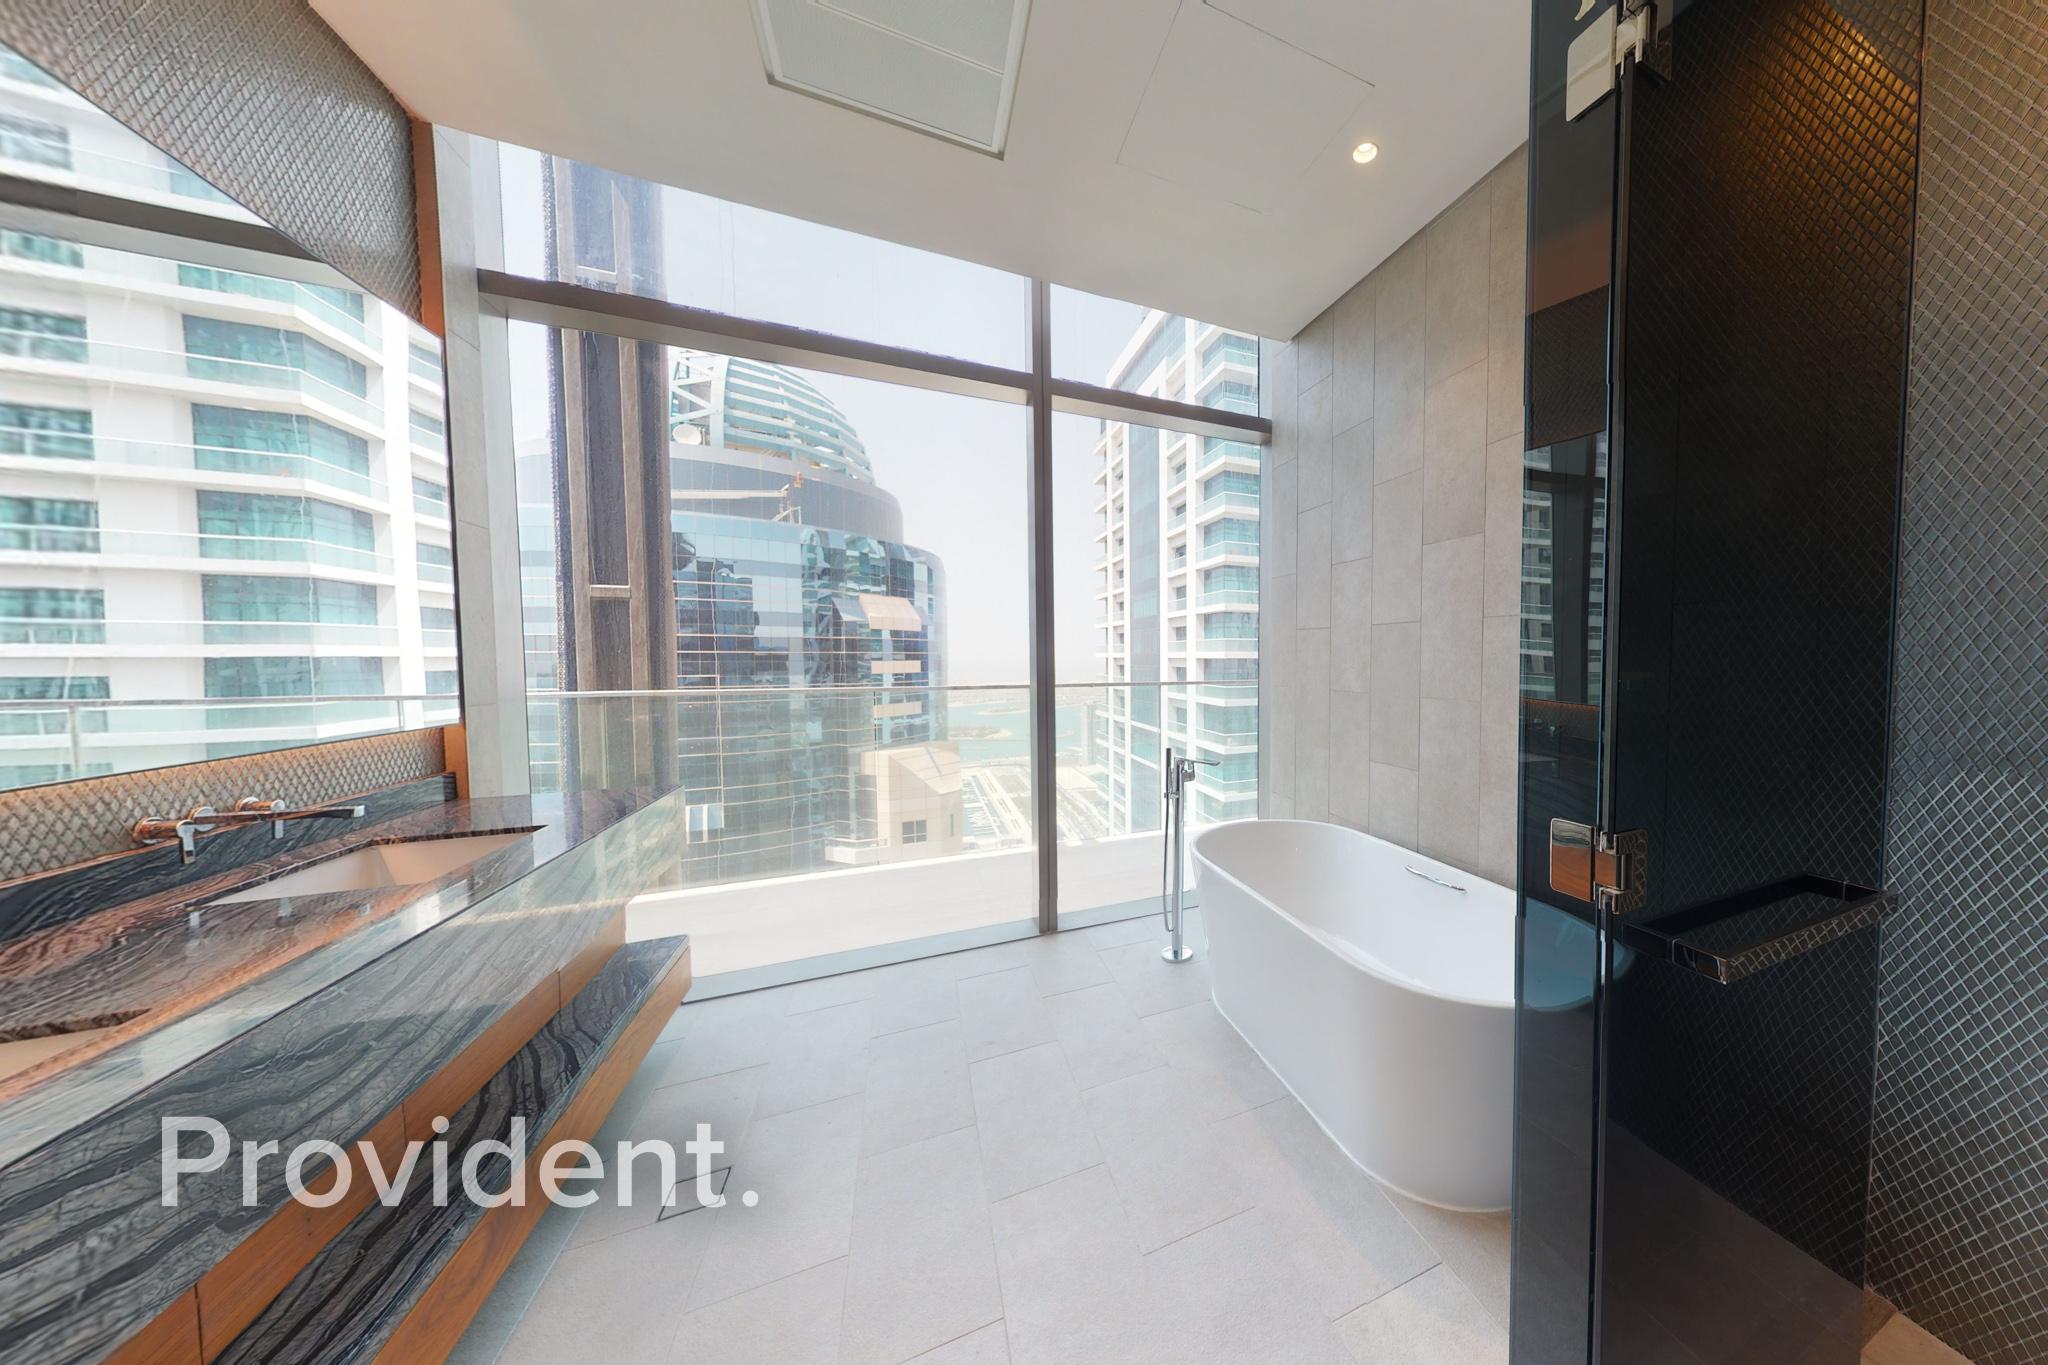 Luxury Penthouse Full Marina View 4 Parking Bays